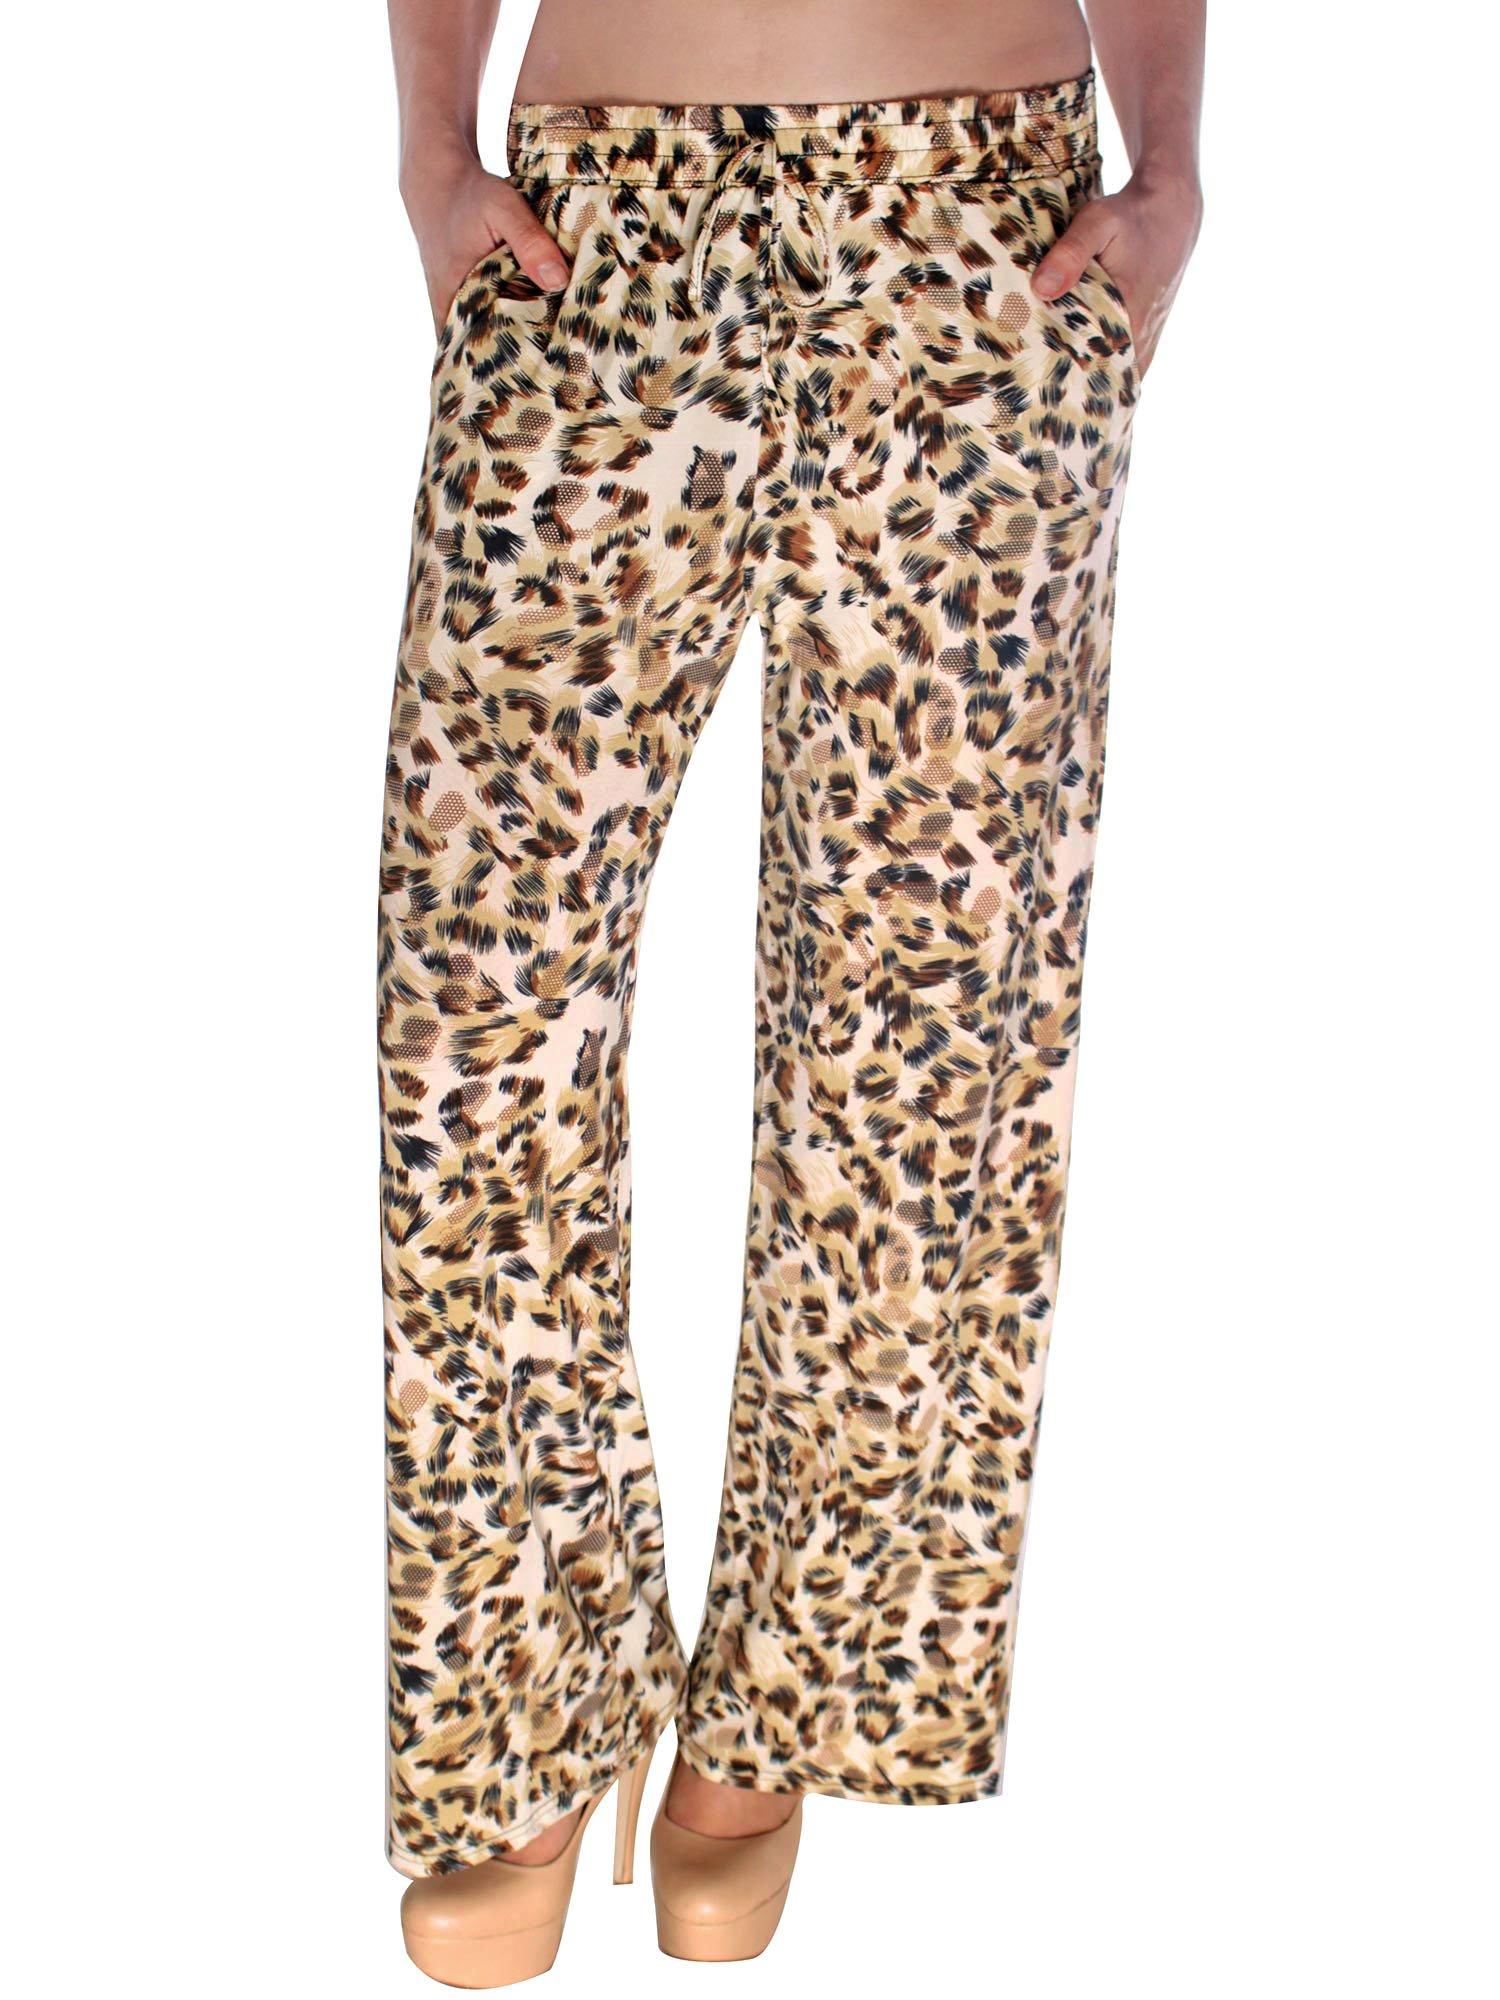 Simplicity Leopard Pattern Print Wide Leg Pants with Drawstring Waistband M